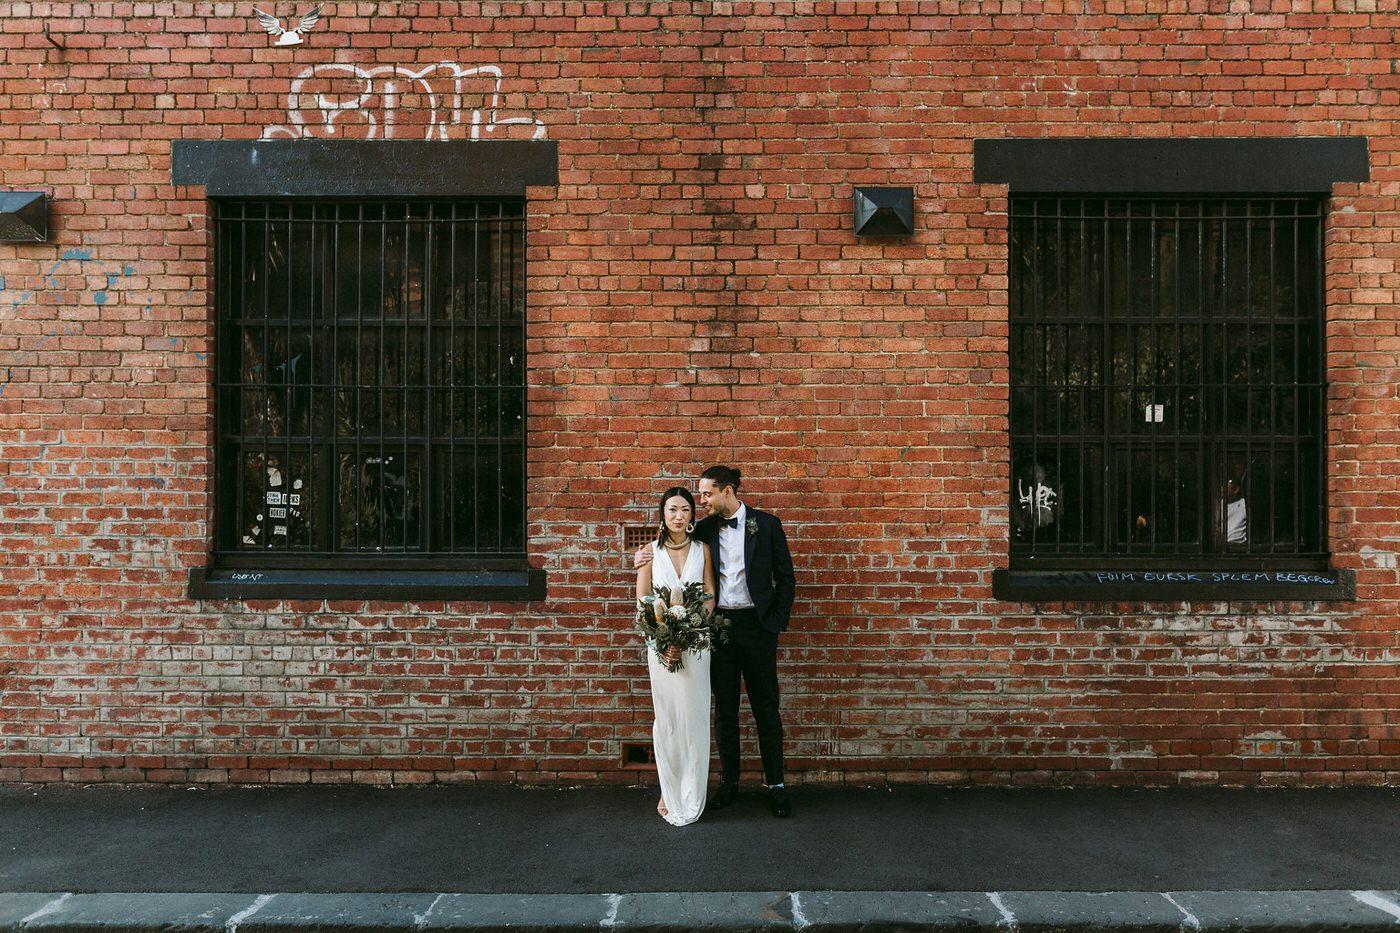 GoldandGrit_KimMatt_Panama-Dining-Room-Fitzroy-Collingwood-Relaxed-Fun-Candid-Wedding-Photography_40.jpg